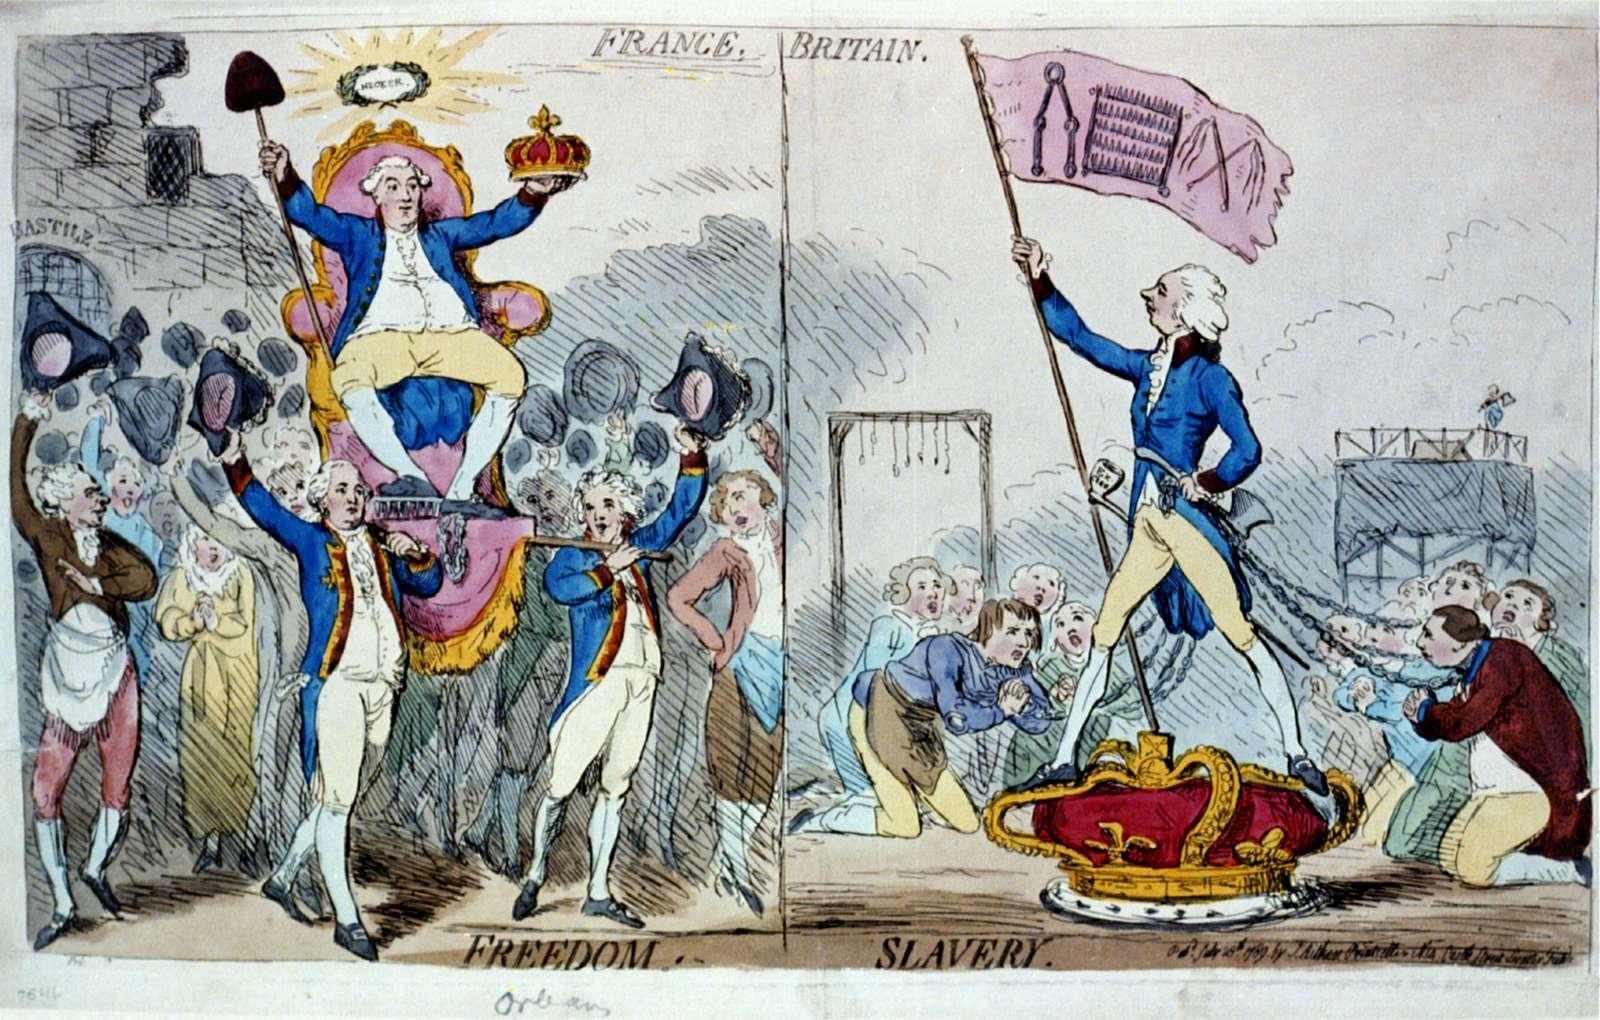 France. Britain. Freedom. Slavery